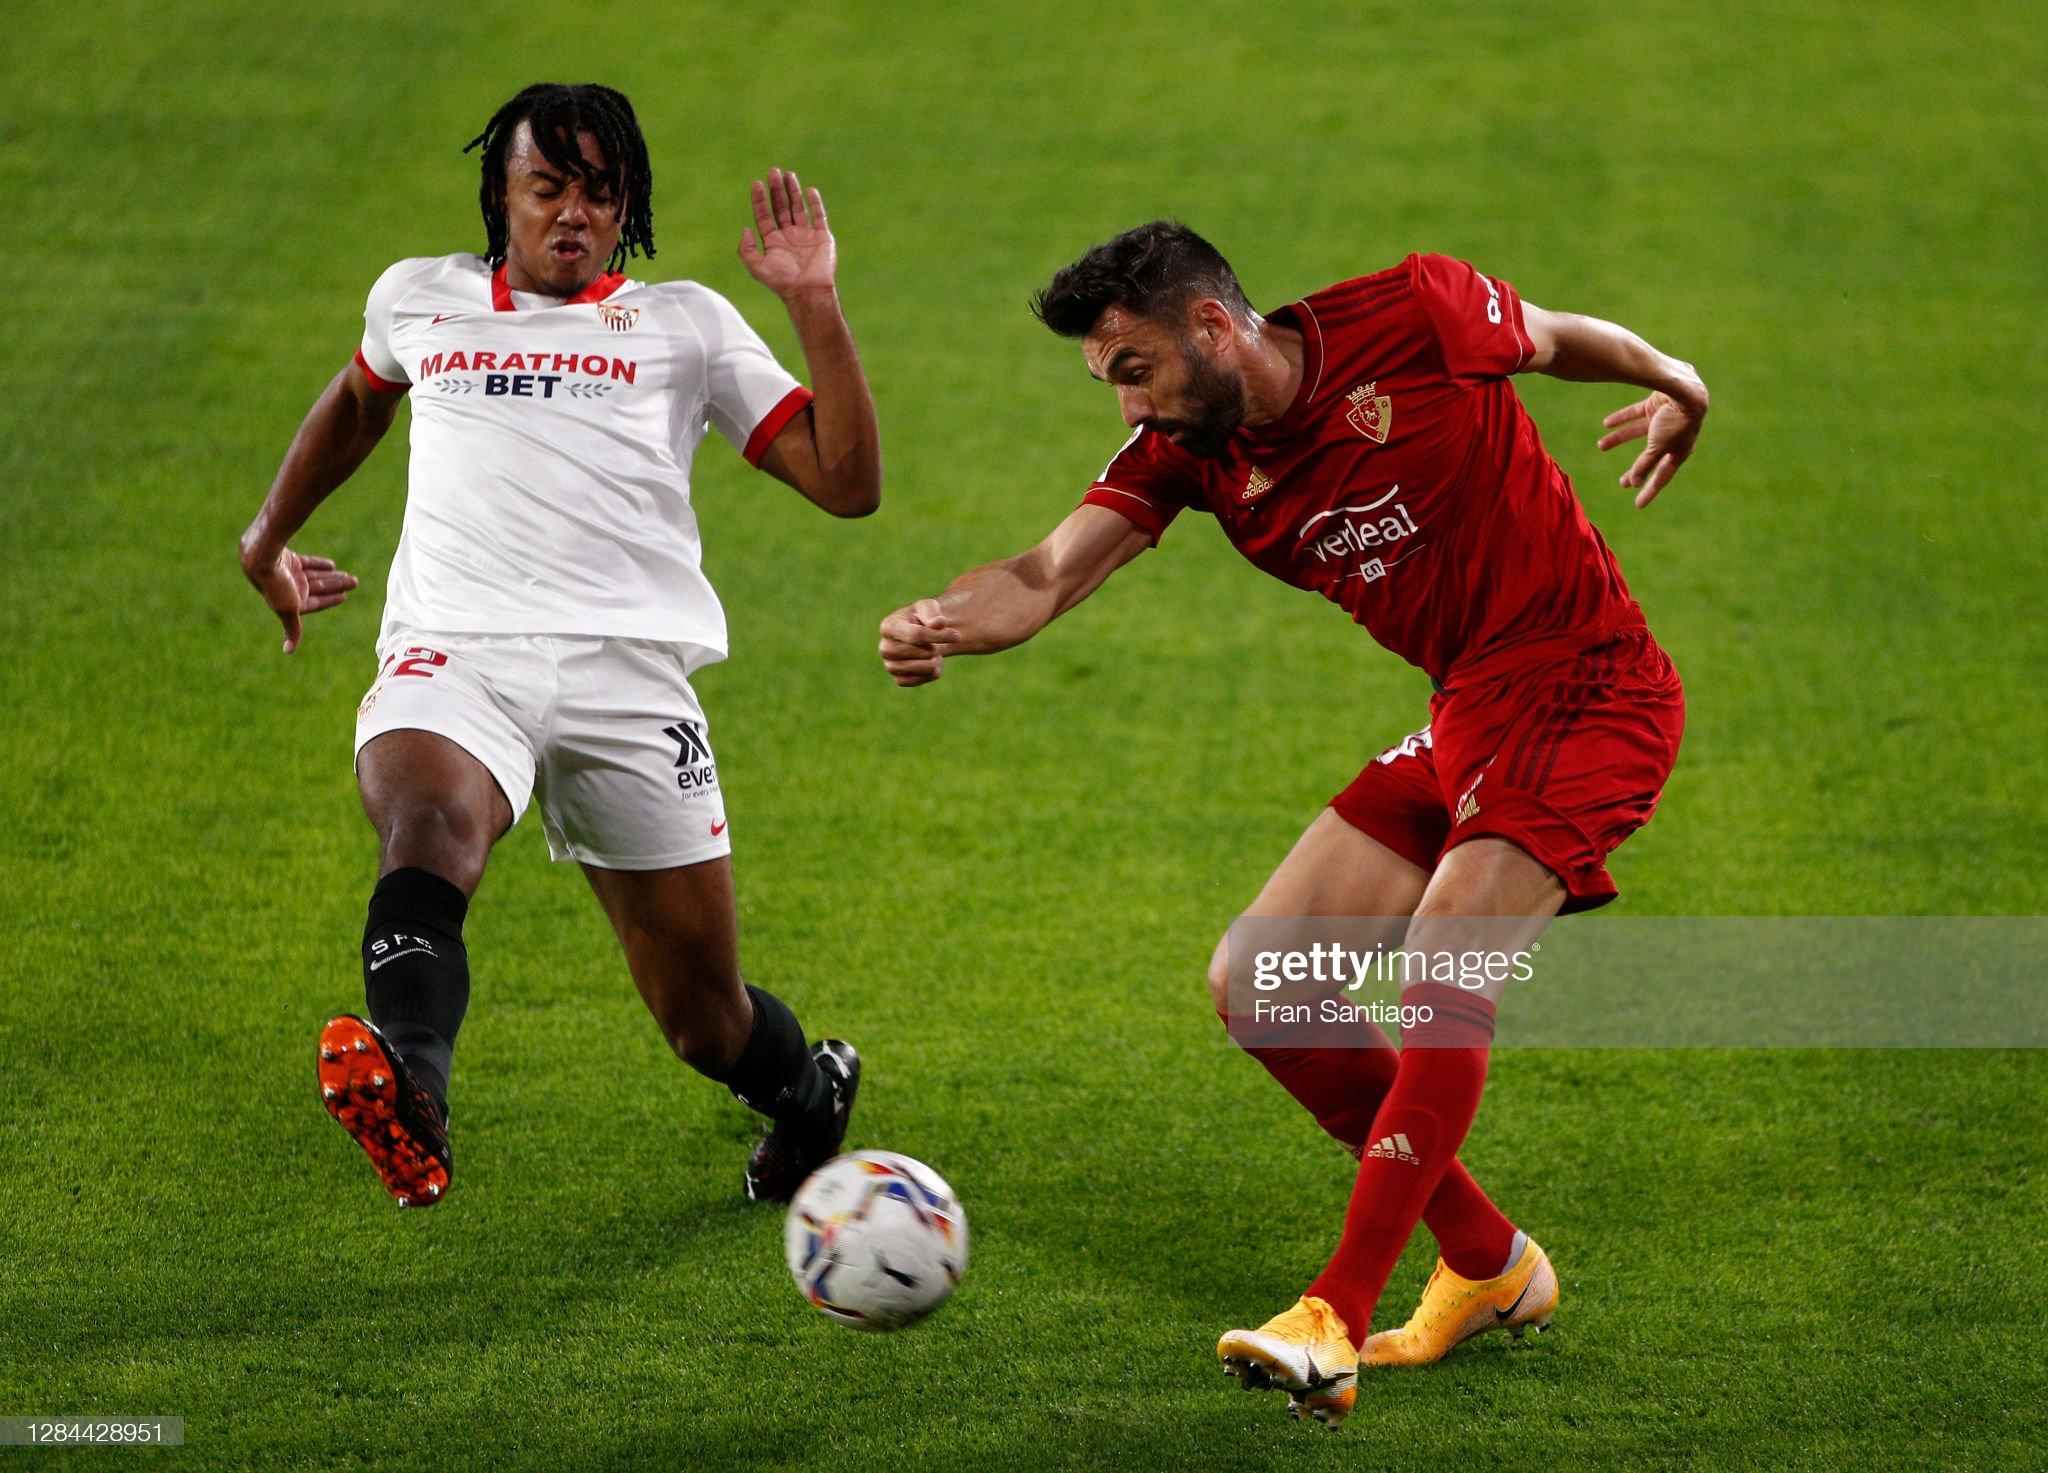 Sevilla FC v C.A. Osasuna - La Liga Santander : News Photo